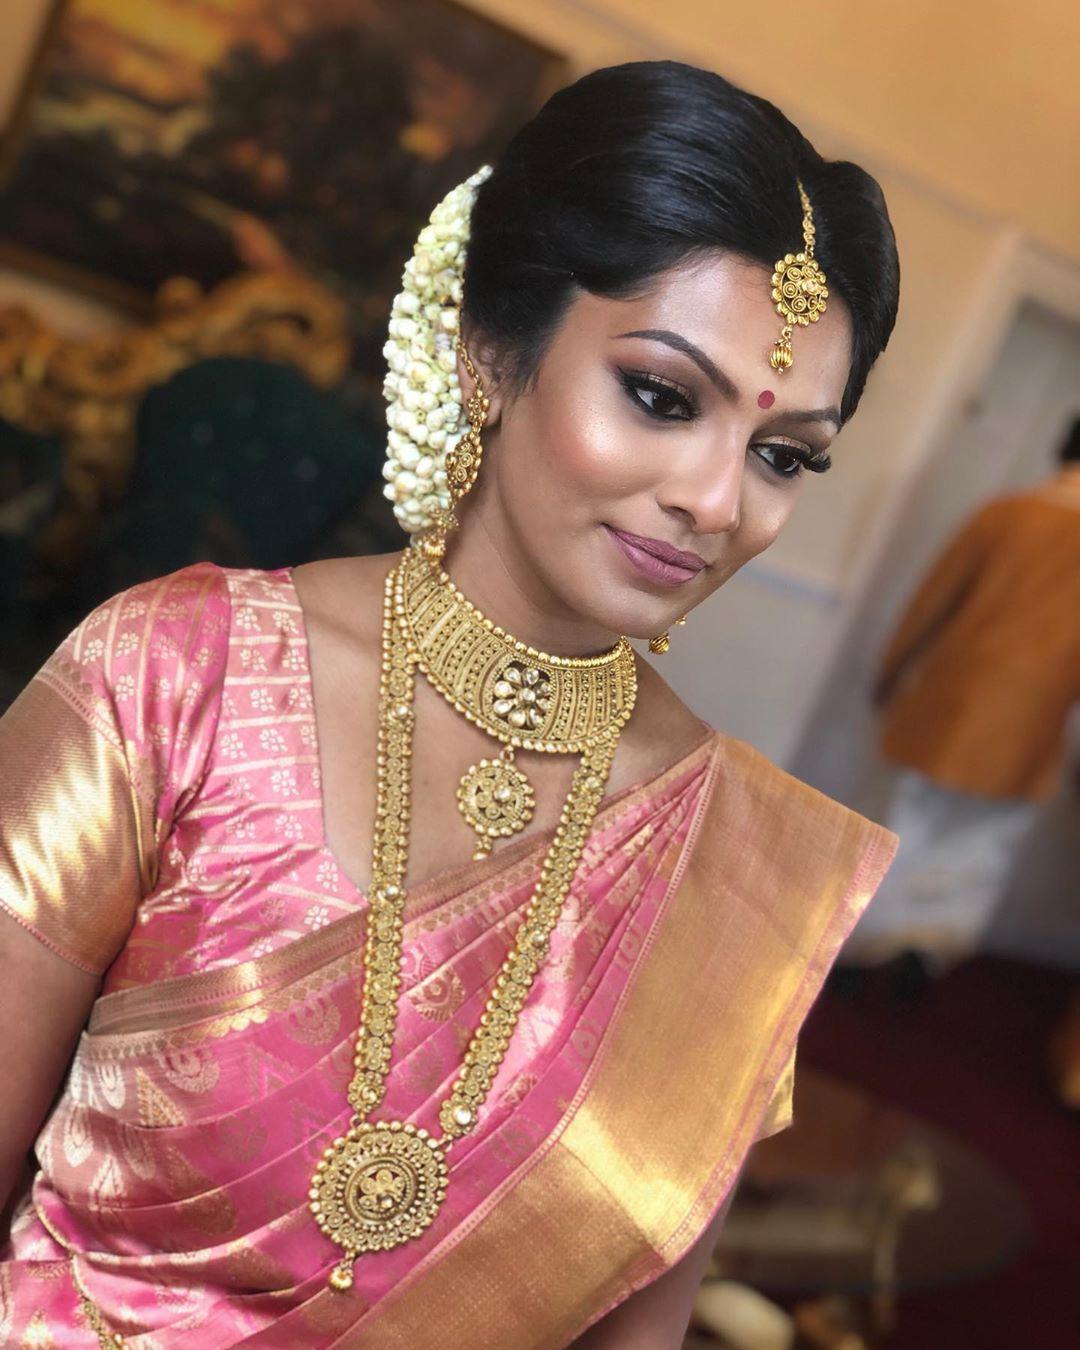 Pin by Parita Suchdev on Bride Portraits Bridal makeup